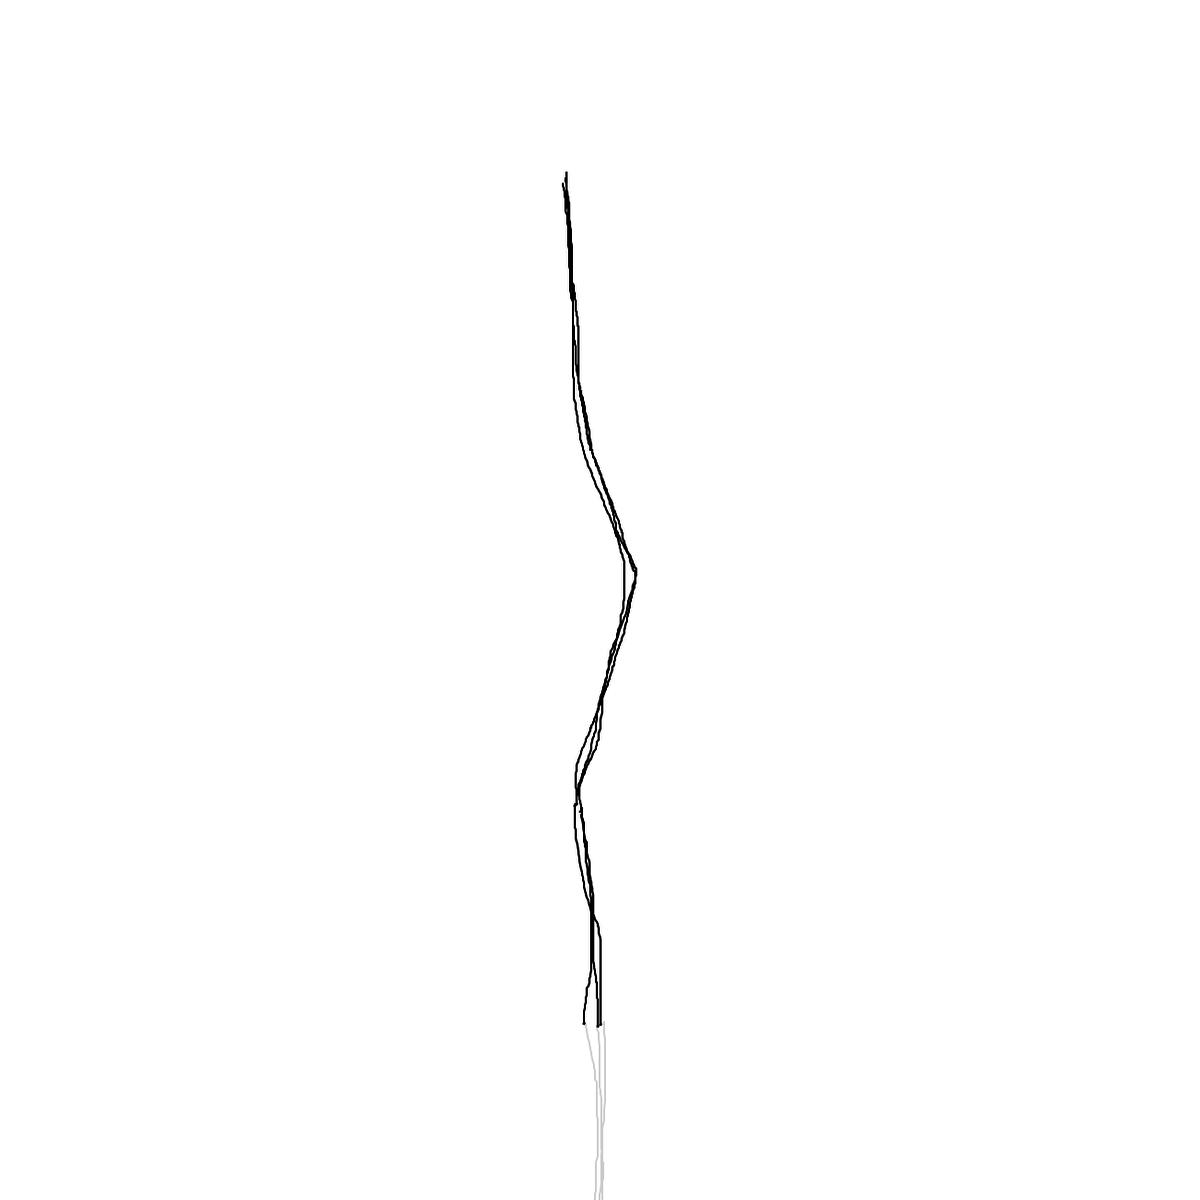 BAAAM drawing#10694 lat:51.0363655090332000lng: -114.0525131225586000